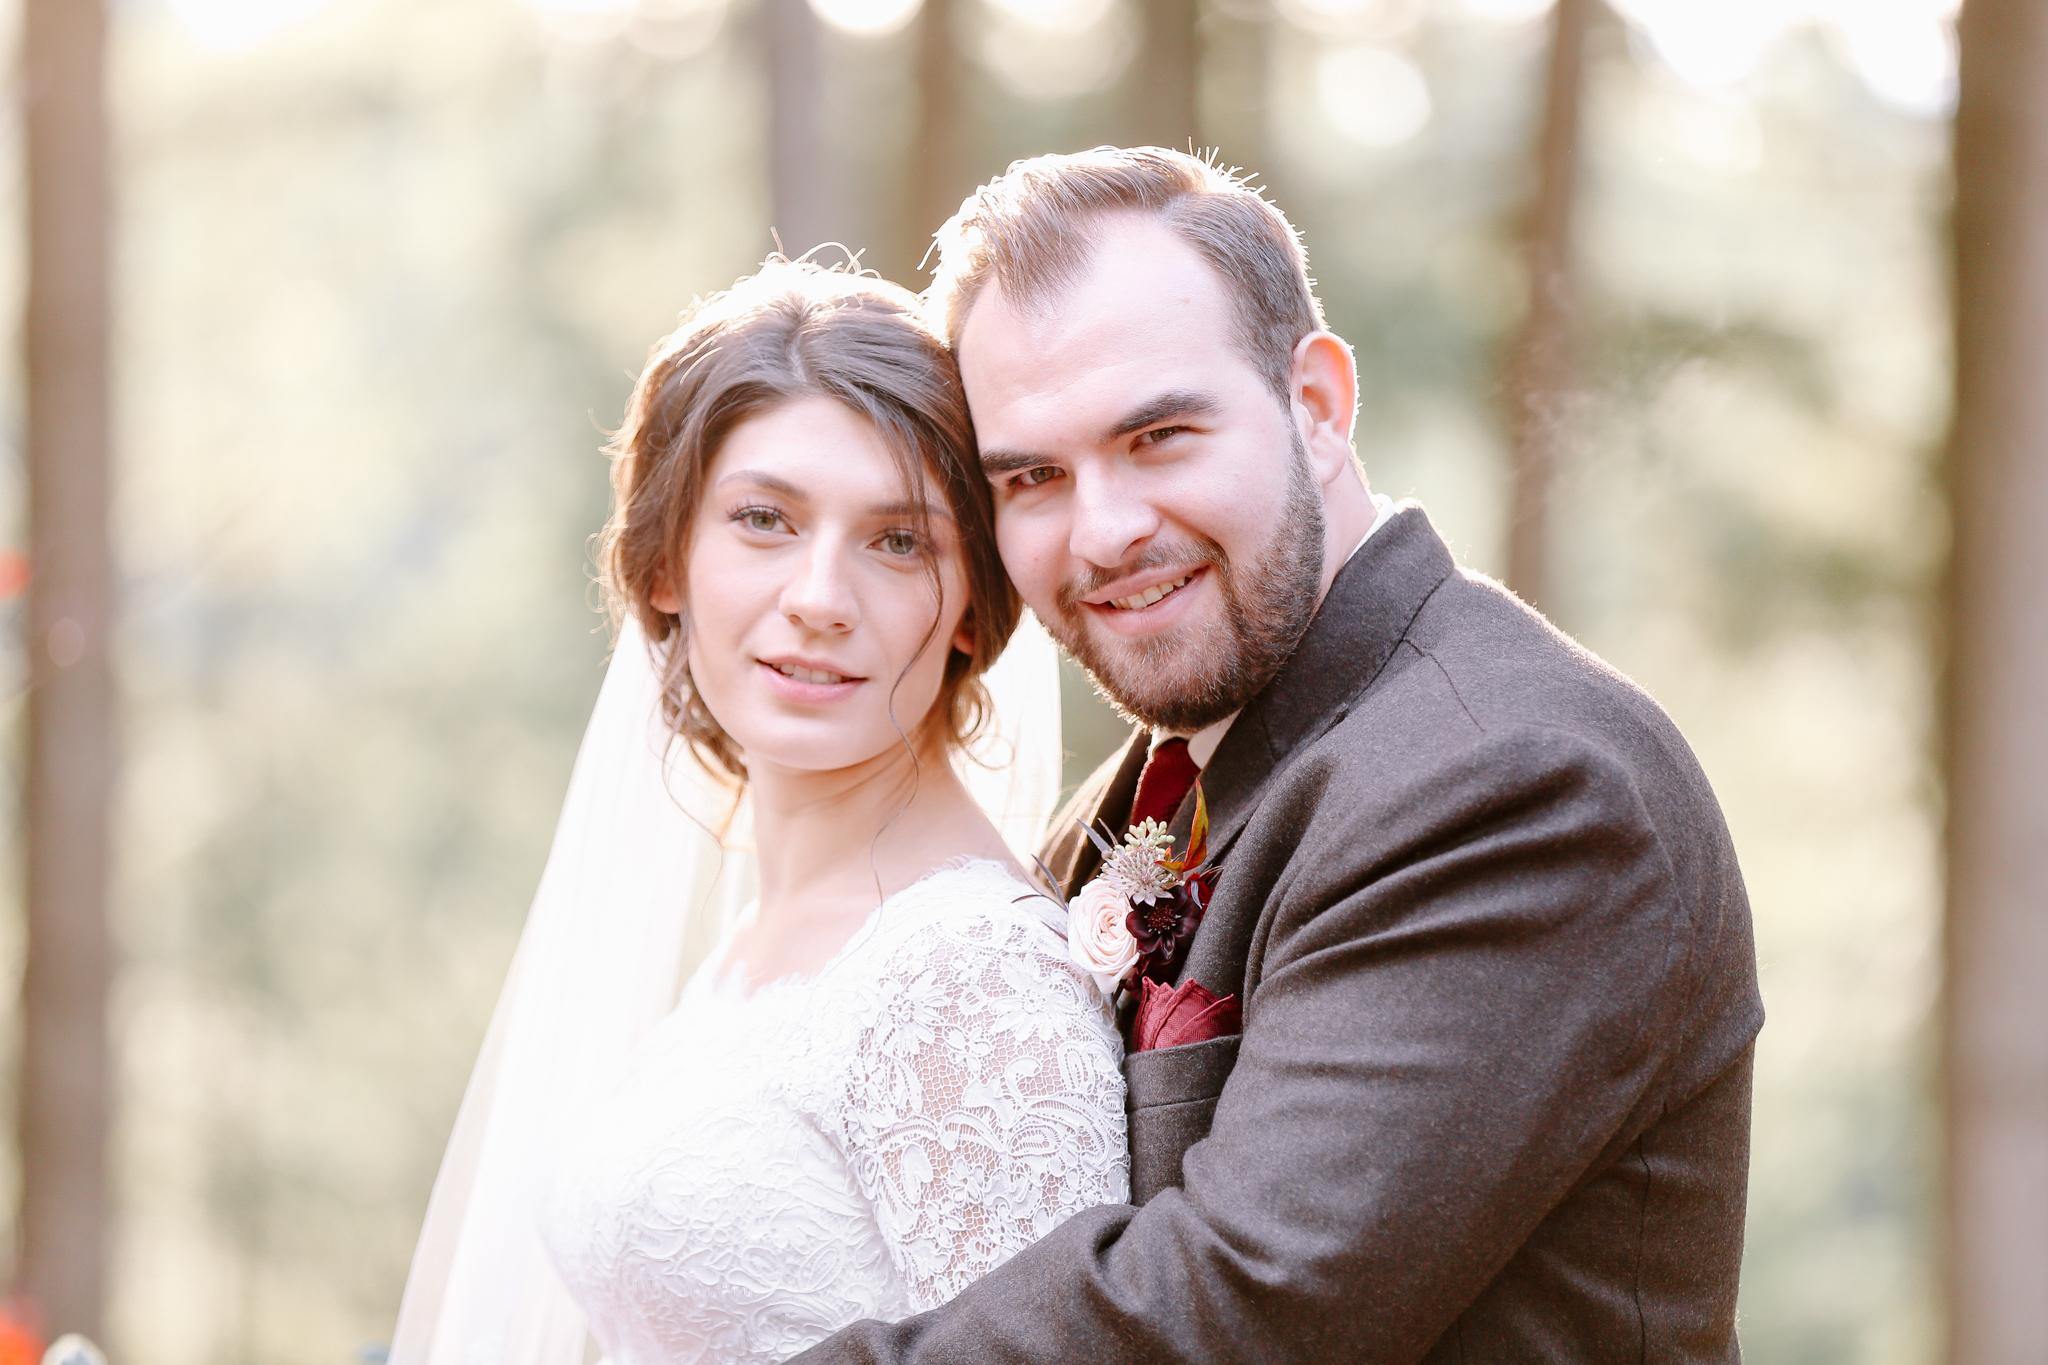 Manu and Laura - Portland Wedding Photographer - 31.jpg